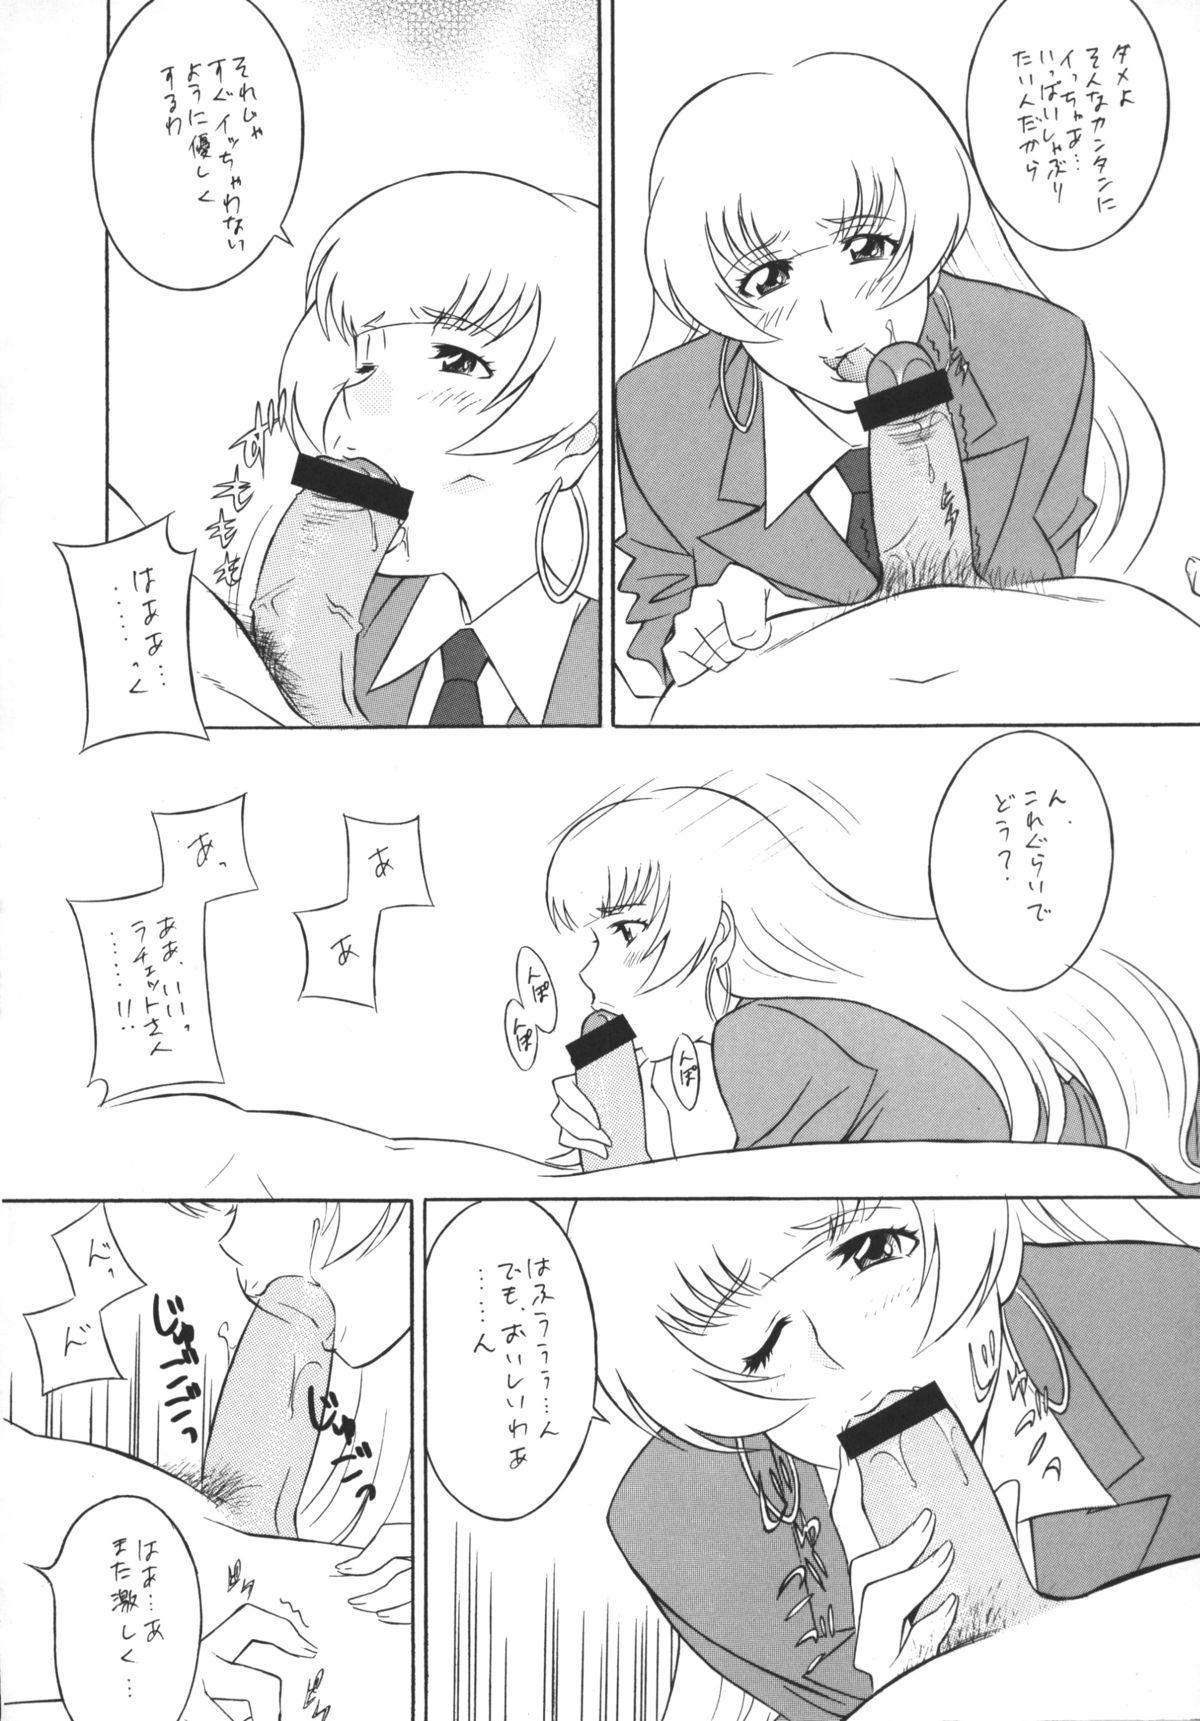 [Okachimentaiko (H-H, Minazuki Akira) Oh! Hentai (Various) 50